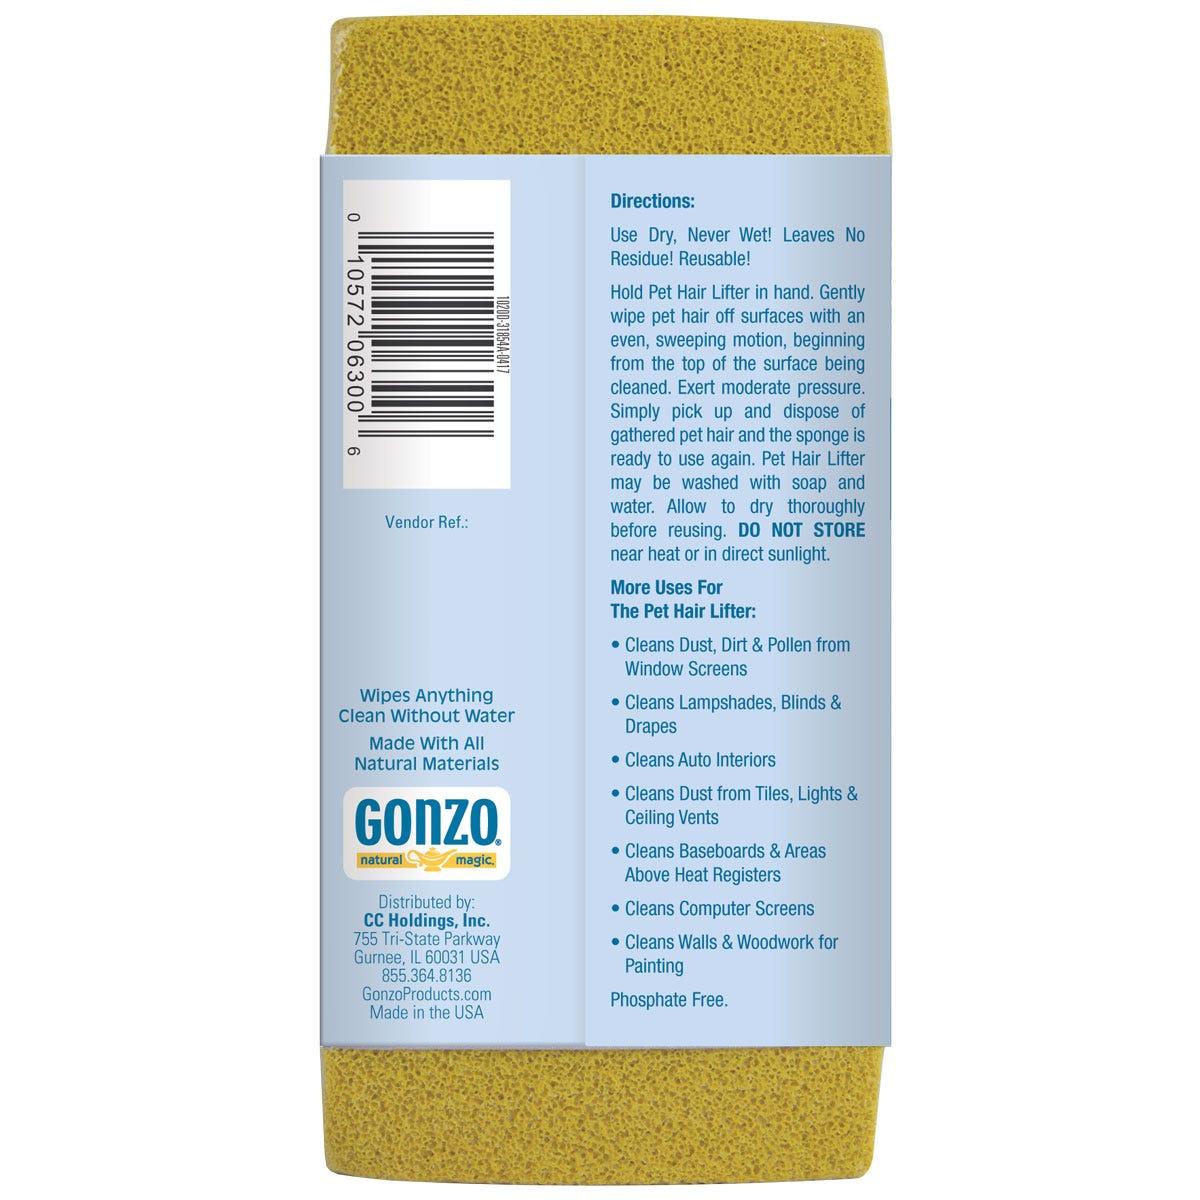 https://googone.com/media/catalog/product/p/e/pet-hair-lifter_back.jpg